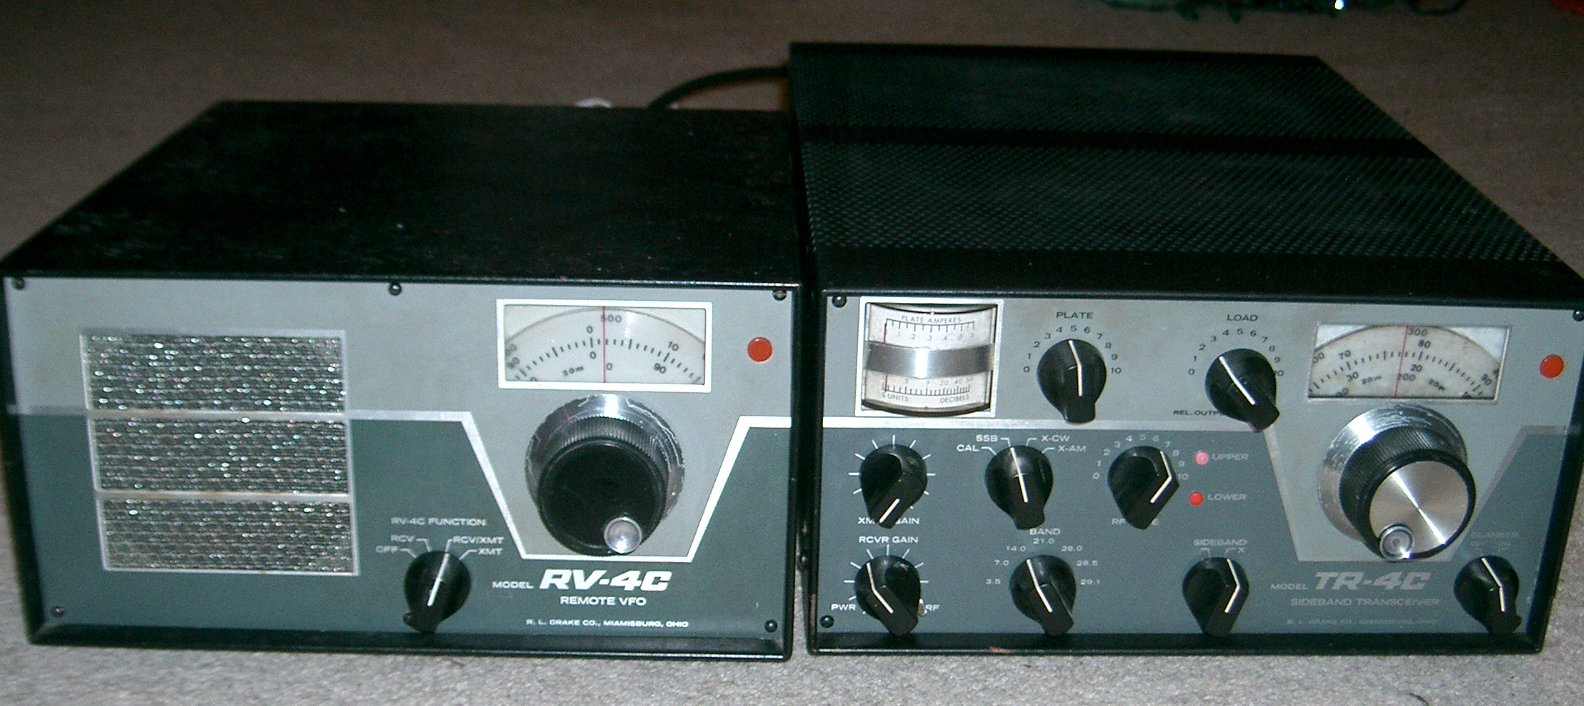 GM3WOJ ZL1CT Vintage transceiver page